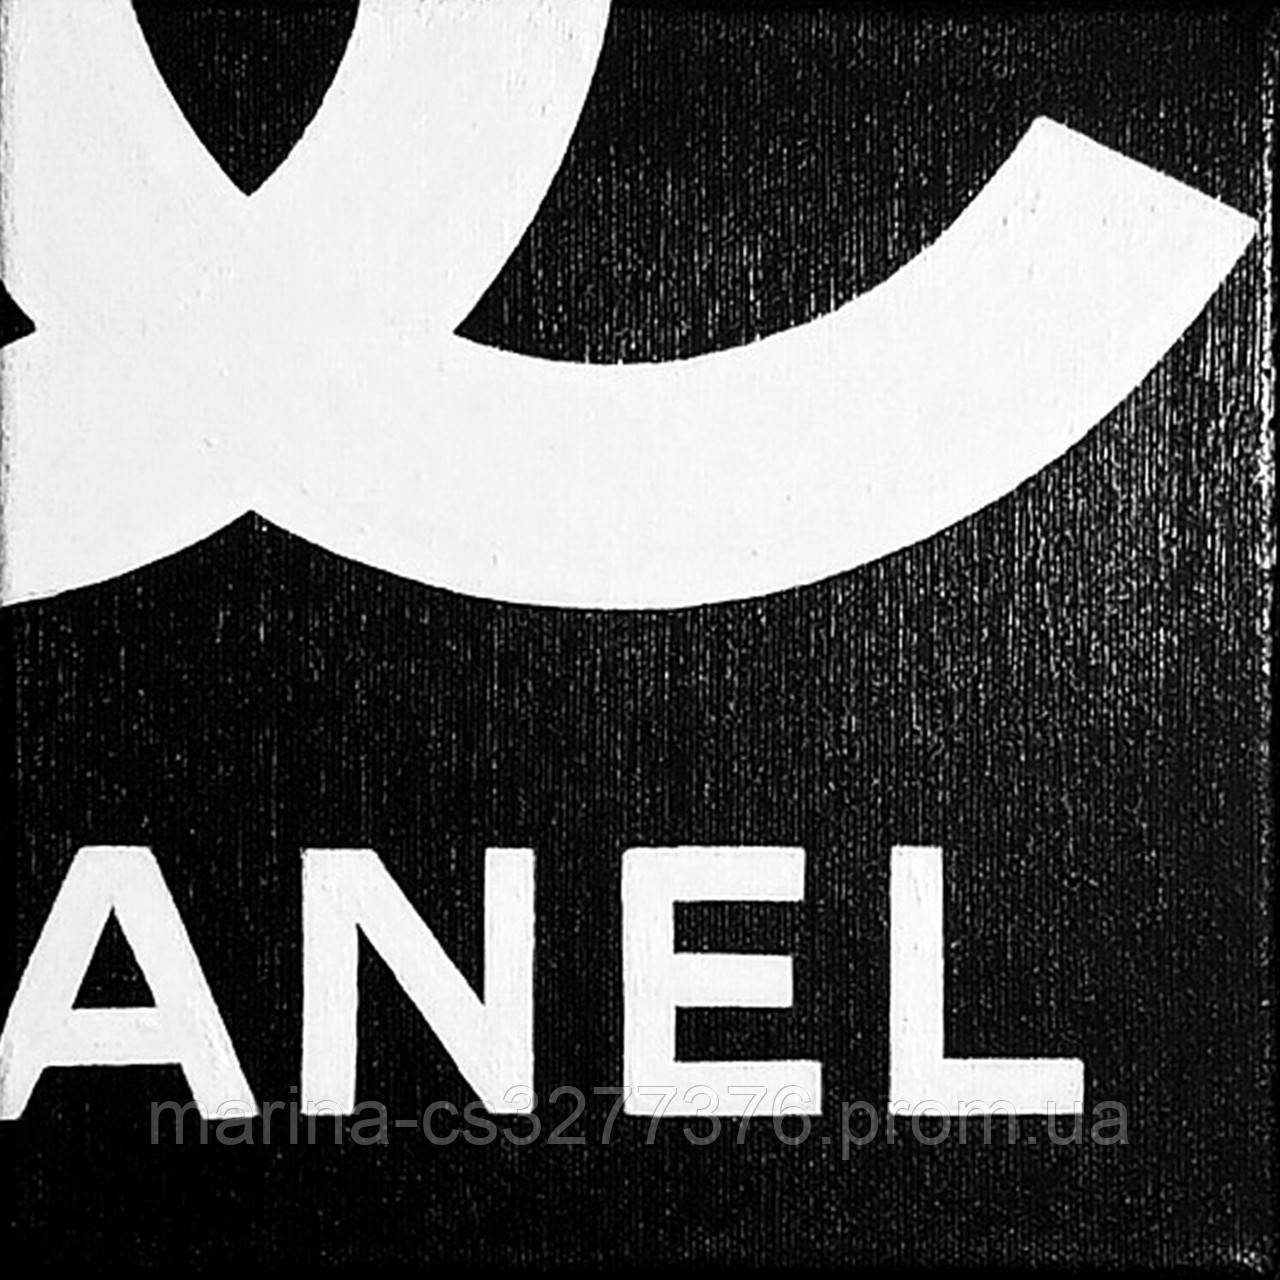 МИНИ картина Кусочек Шанели 20х20 см холст акрил галерейная натяжка поп-арт